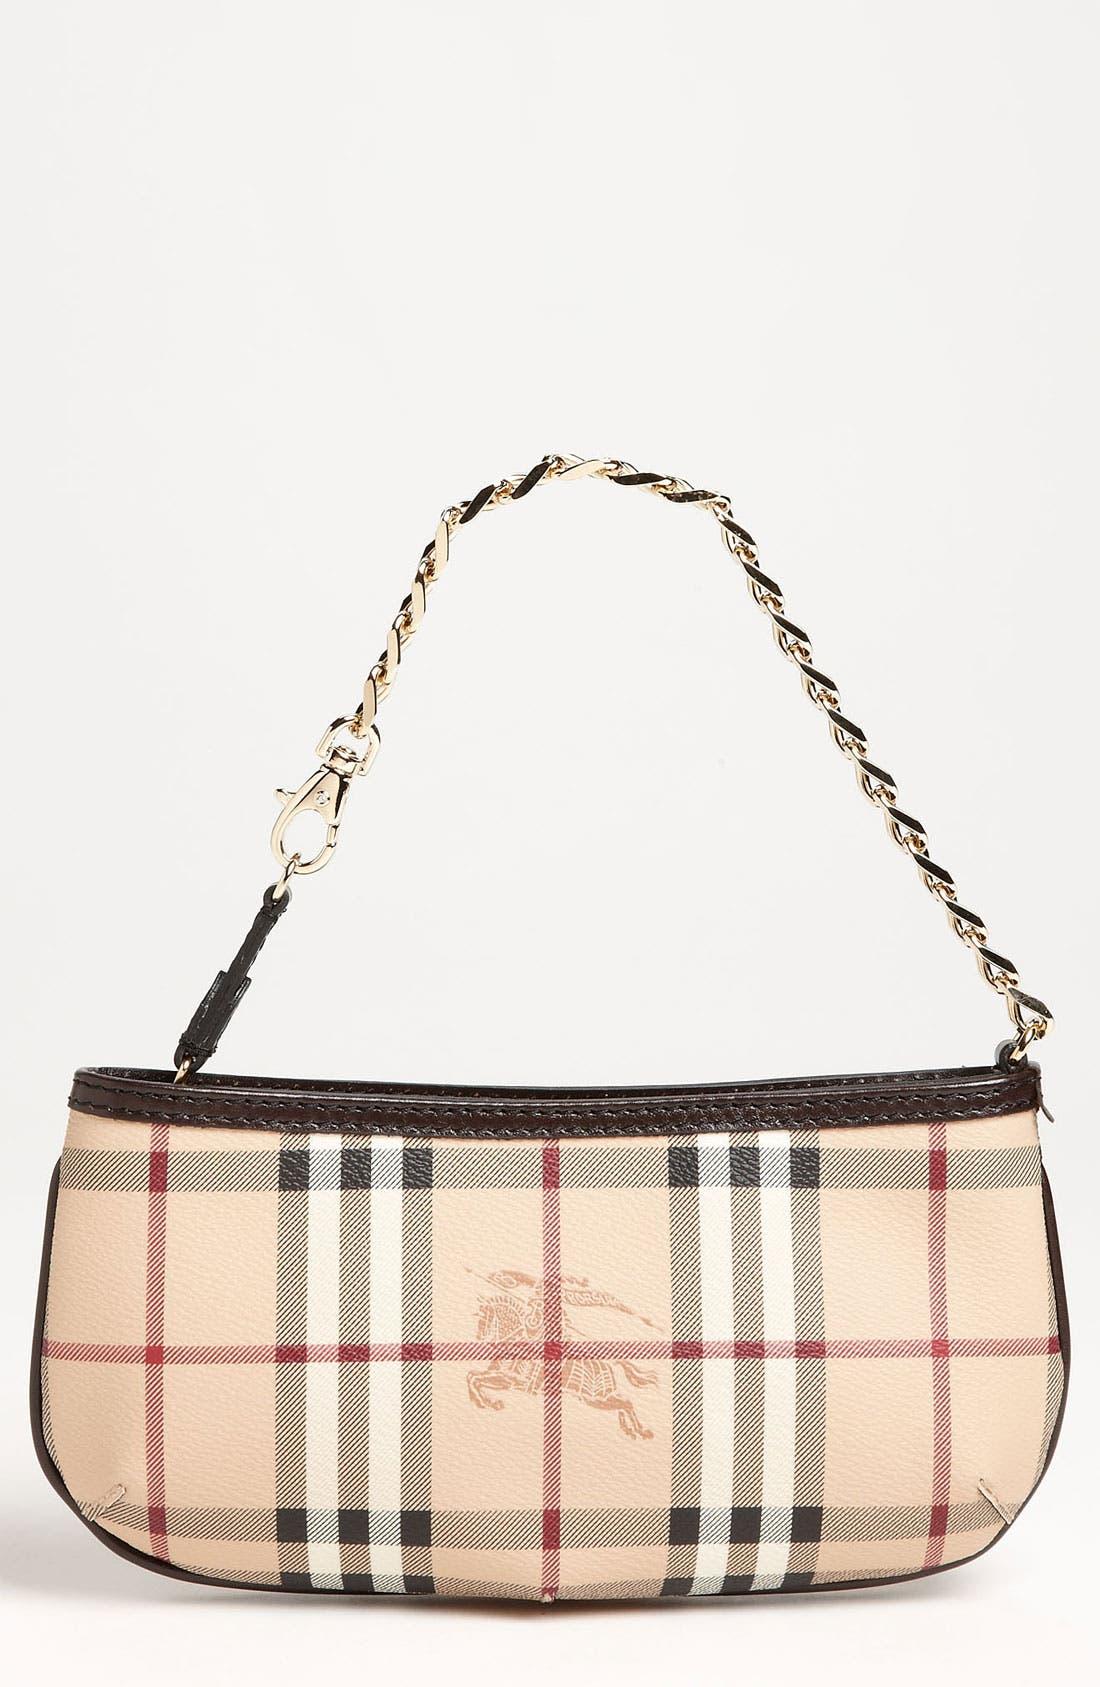 Alternate Image 1 Selected - Burberry 'Haymarket Check' Mini Shoulder Bag